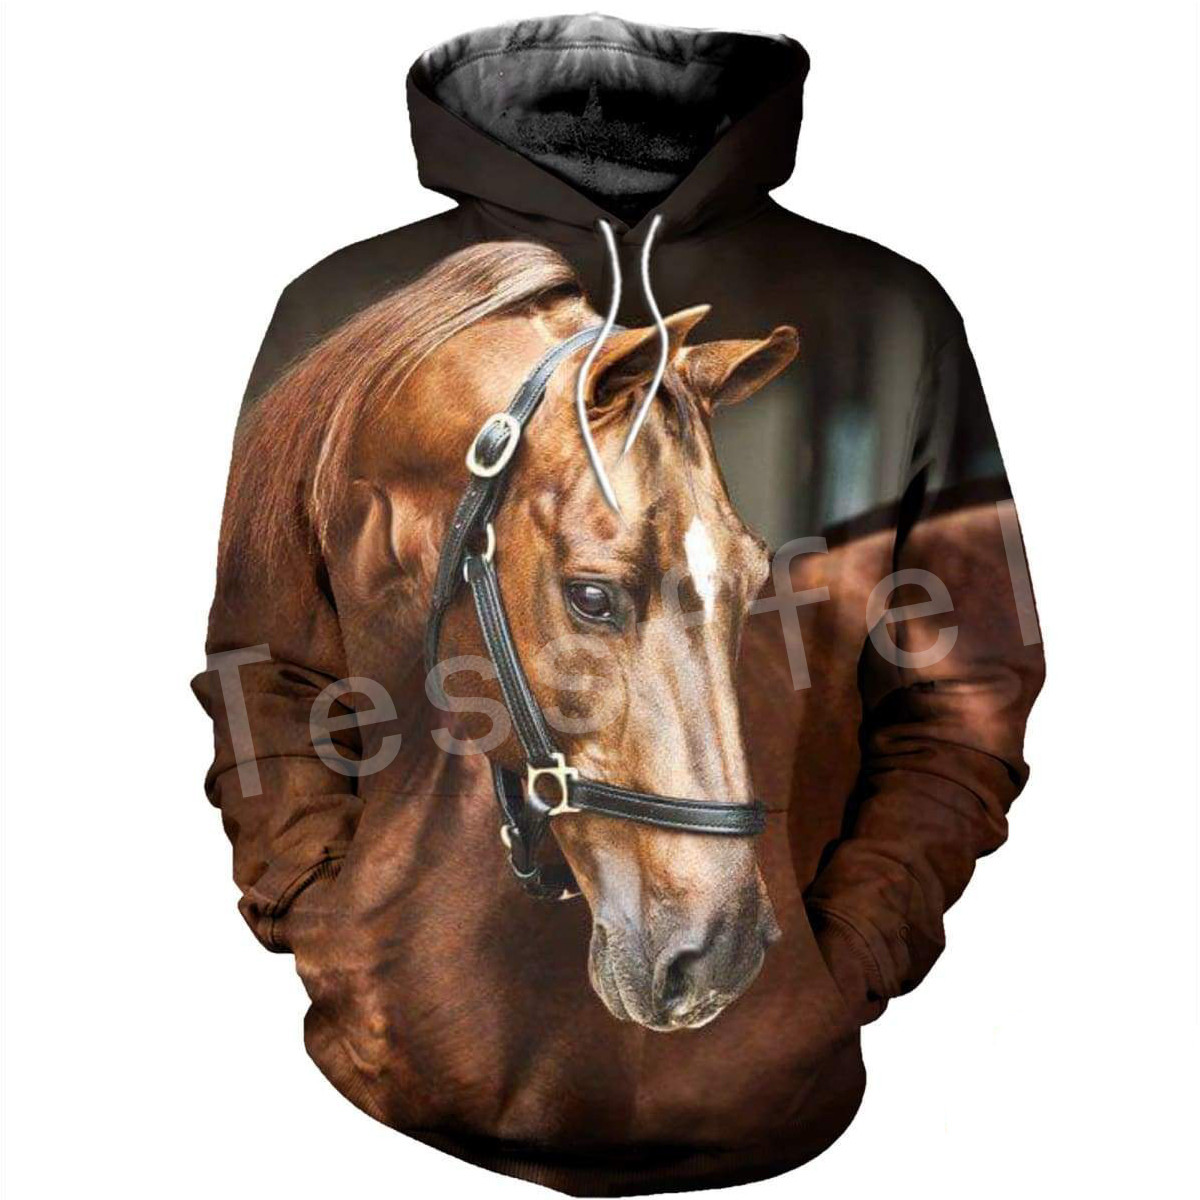 Tessffel Animal Horse art Unisex Colorful Casual Tracksuit Harajuku 3Dfull Print Hoodie/Sweatshirt/Jacket/shirts Mens Womens s-9